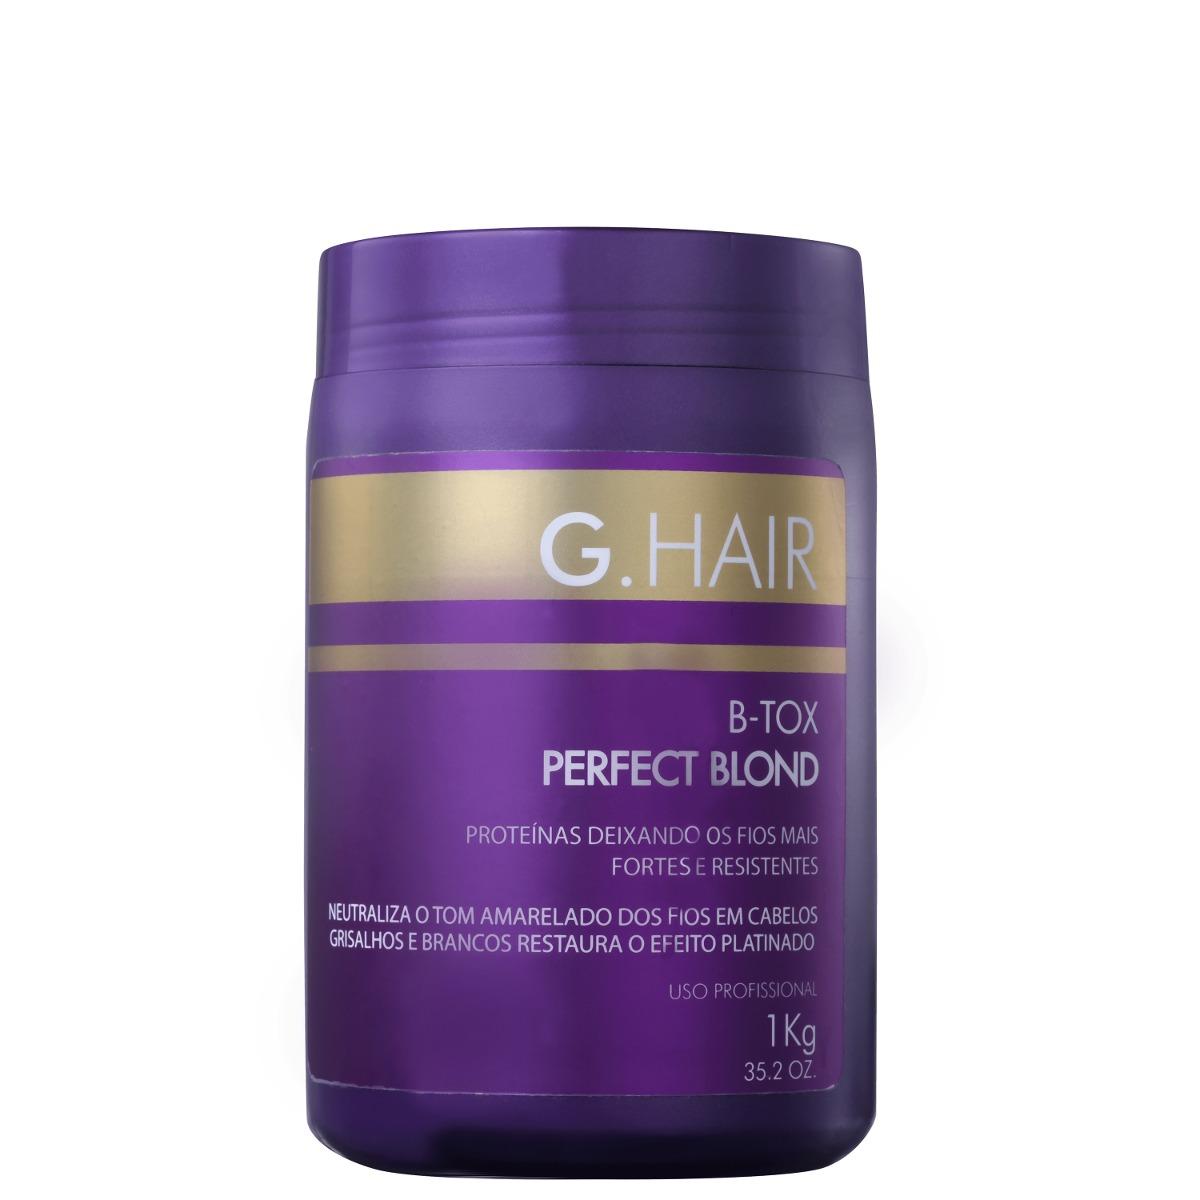 43525fa52 G.hair Perfect Blond B-tox - Máscara 1000g Blz - R$ 45,90 em Mercado ...